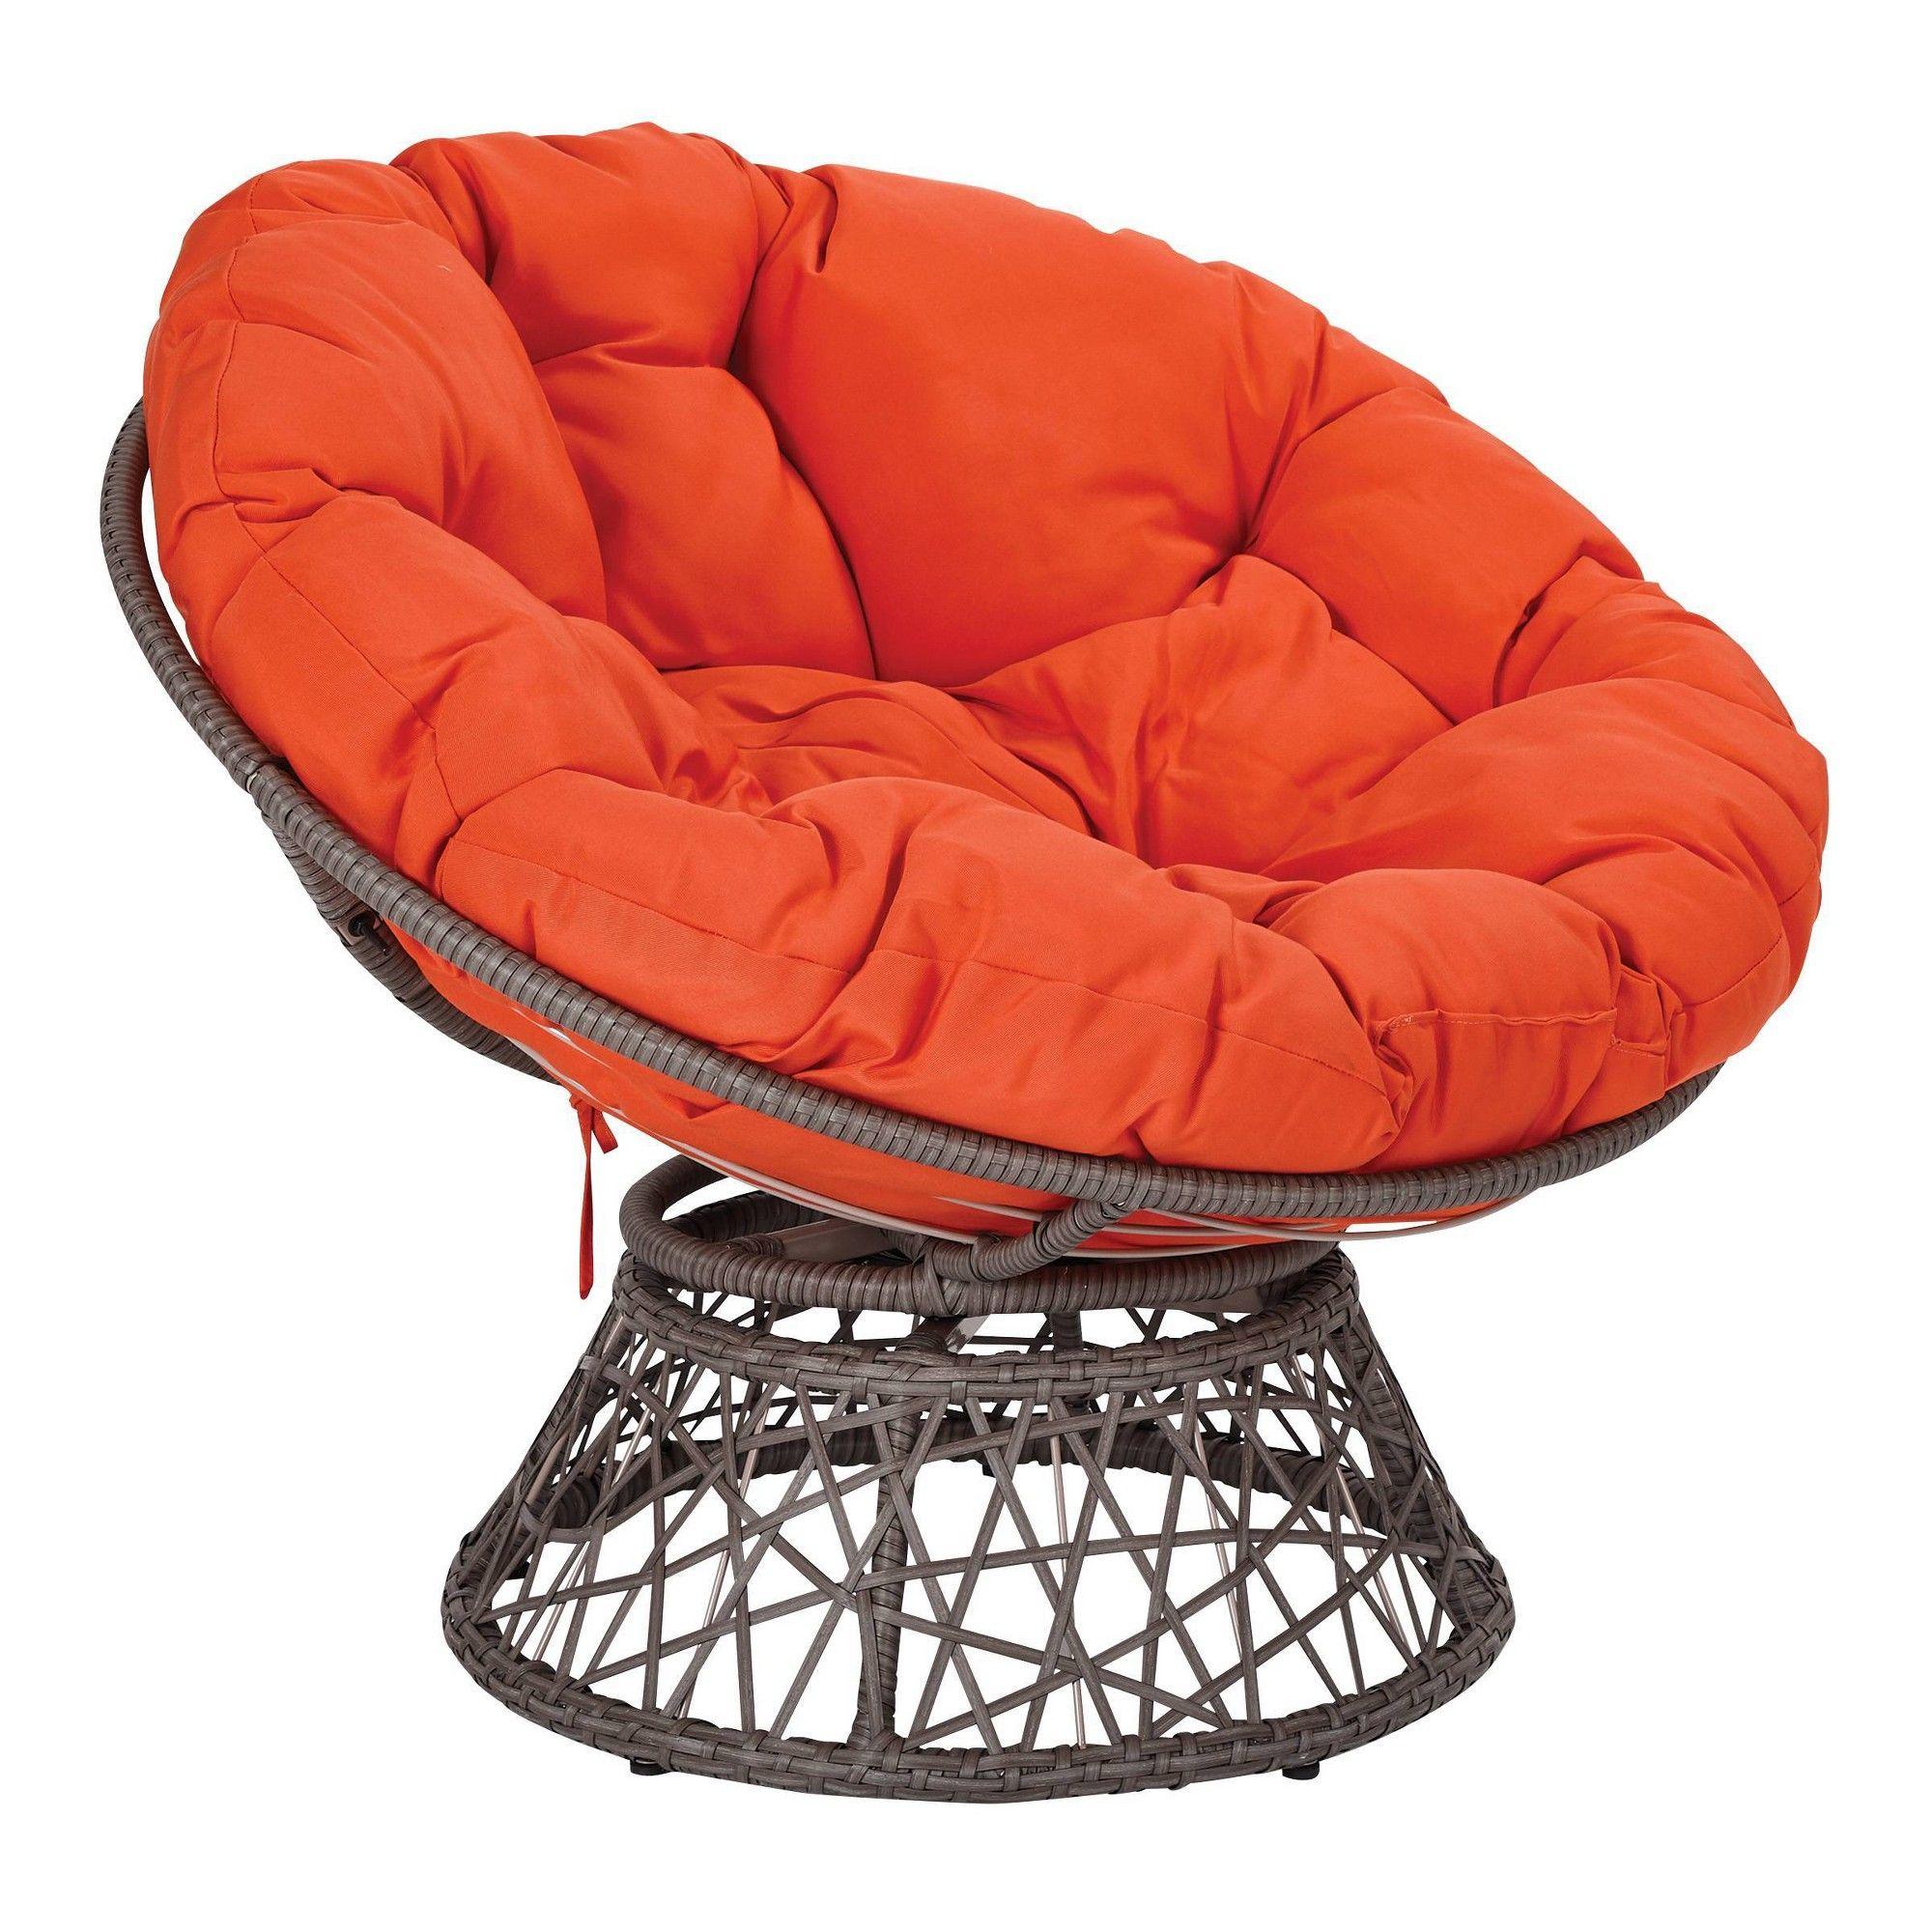 Papasan Chair Orange Osp Home Furnishings Adult Unisex